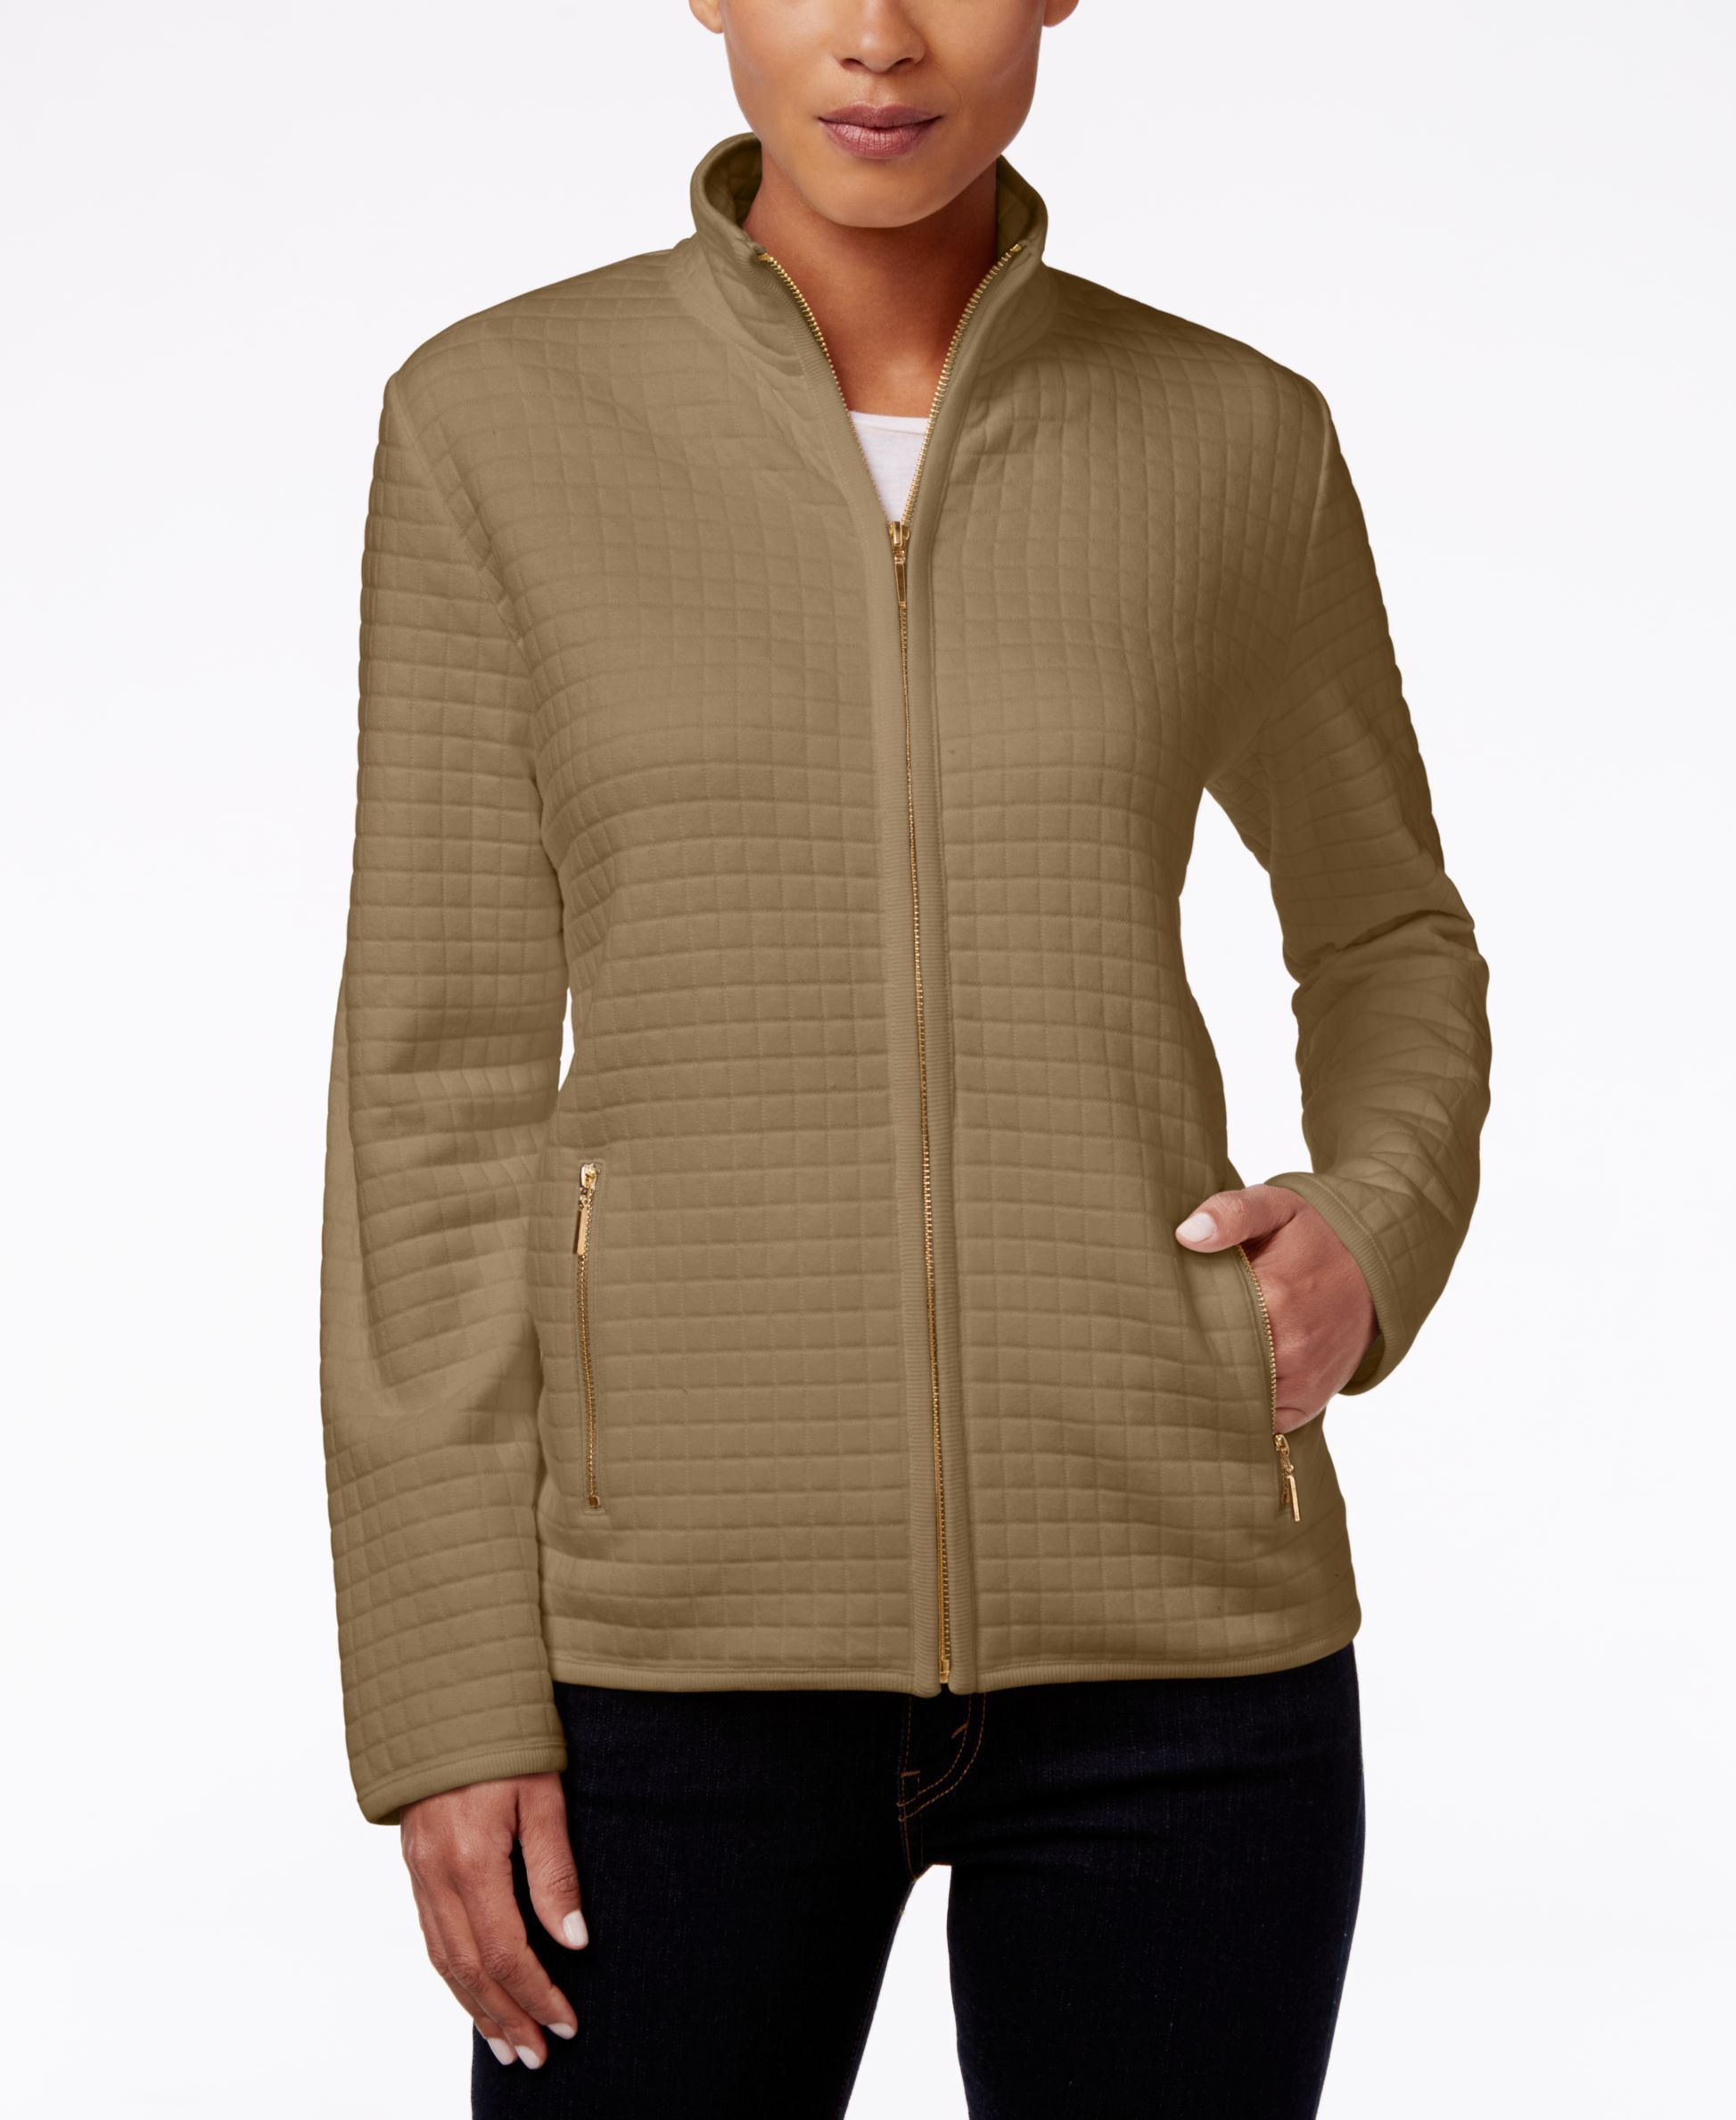 Karen Scott Quilted Zipper Front Jacket Only At Macy S Blazer Jackets For Women Zipper Front Jacket Jackets [ 2378 x 1947 Pixel ]